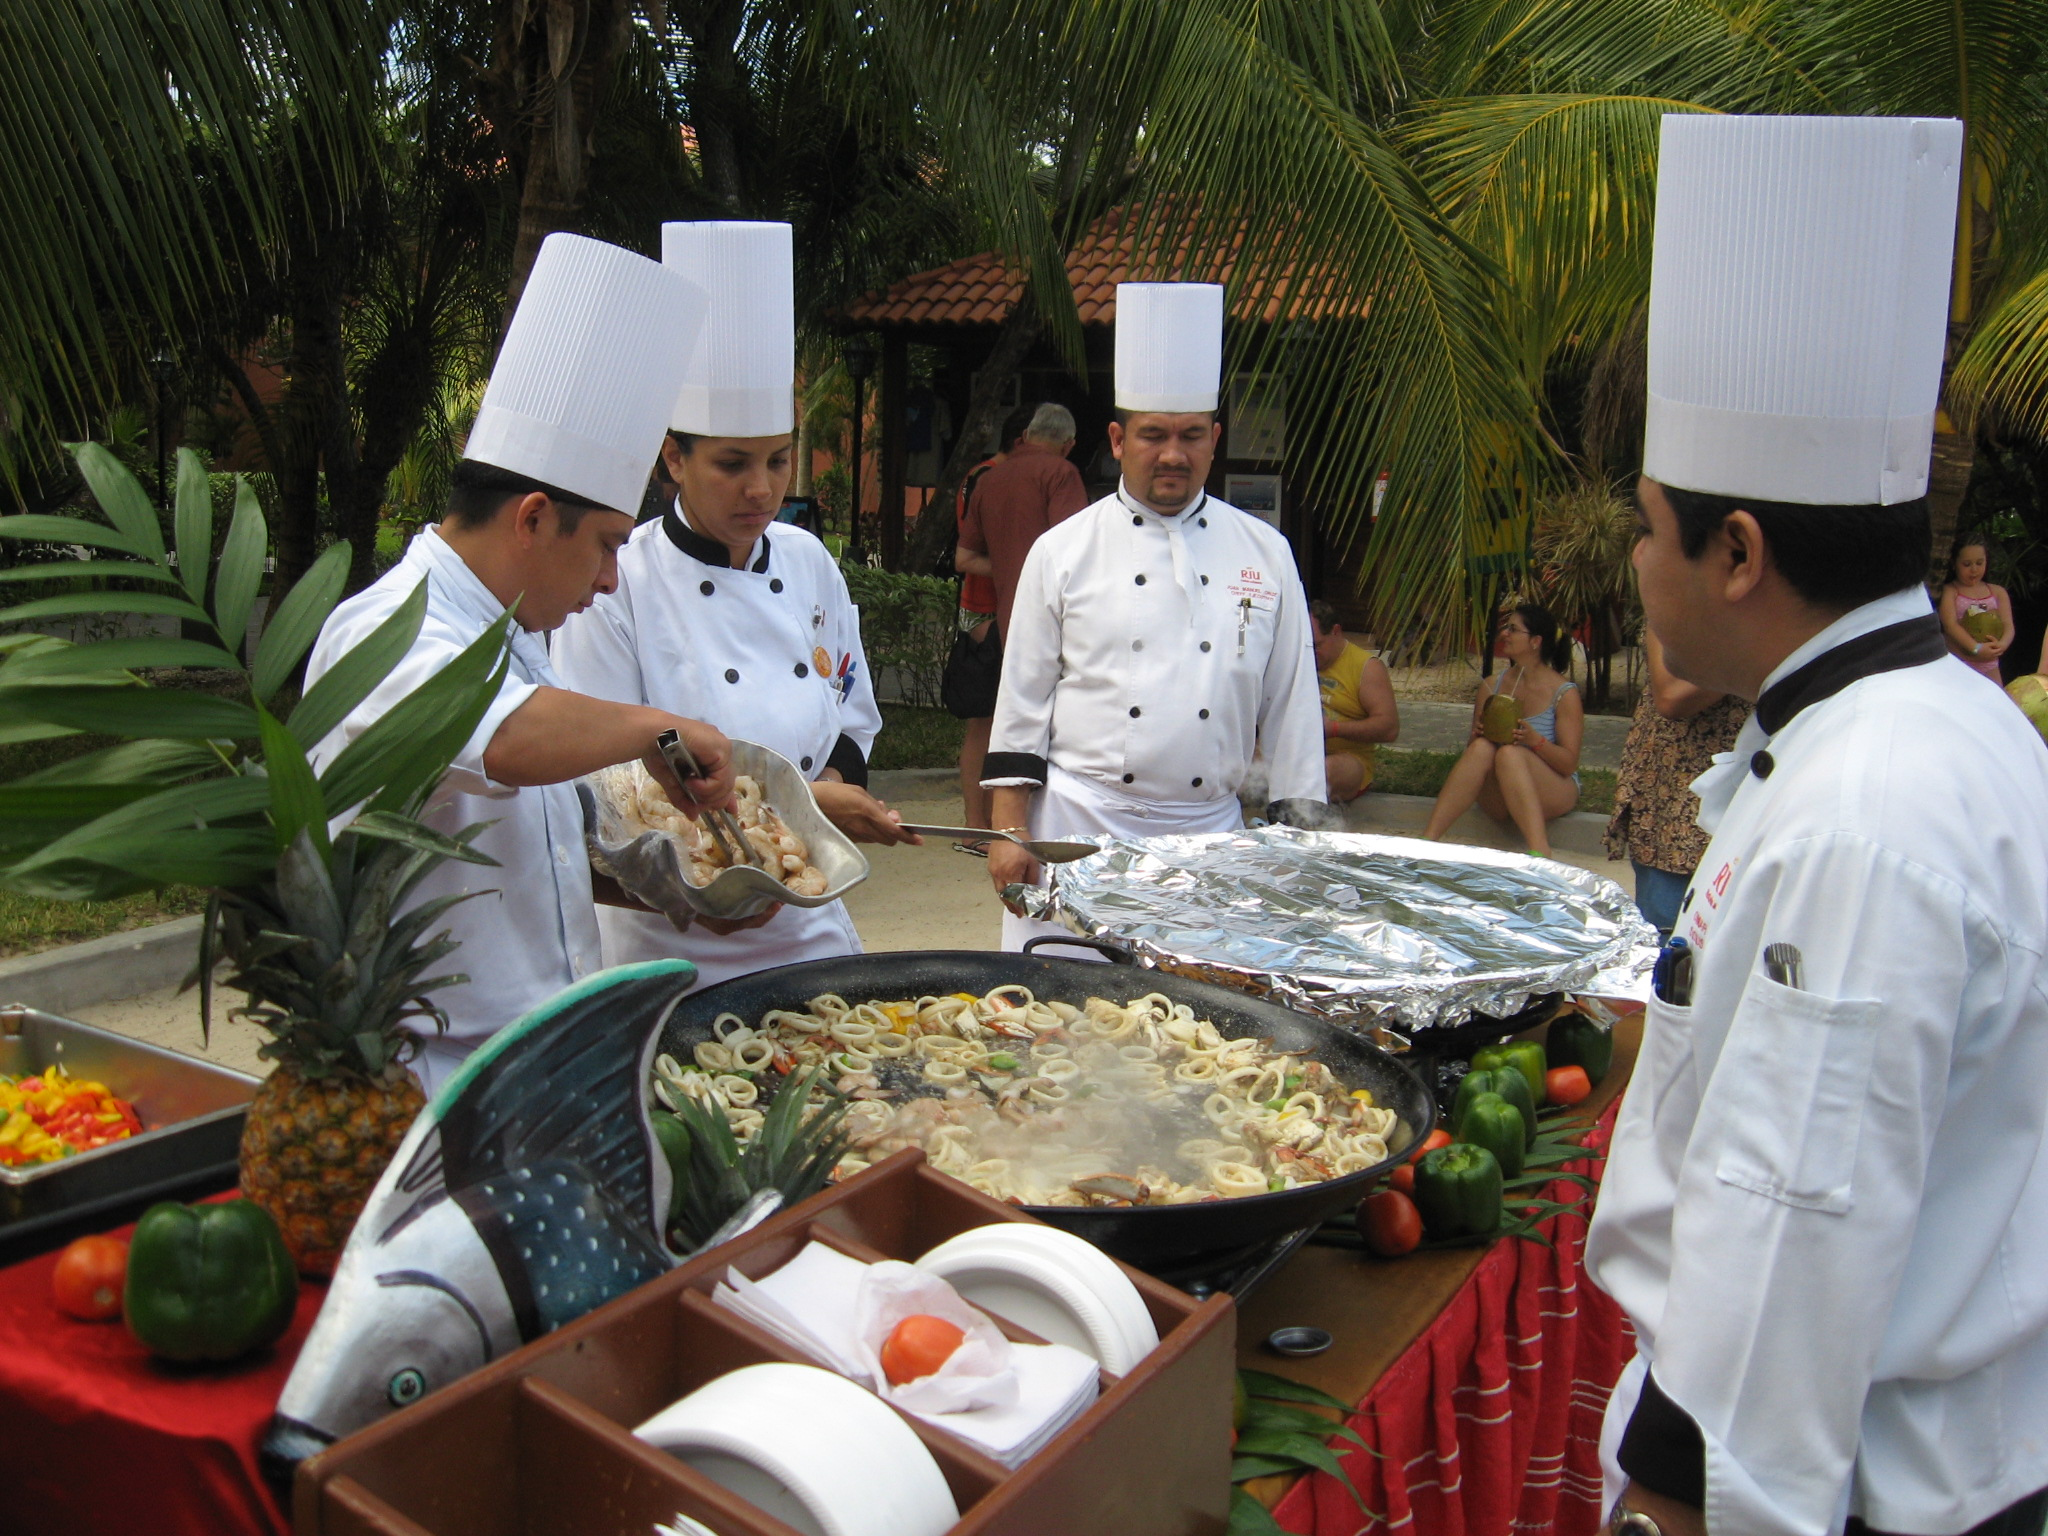 Kitchen Staff Food Preparation Evaluation Form